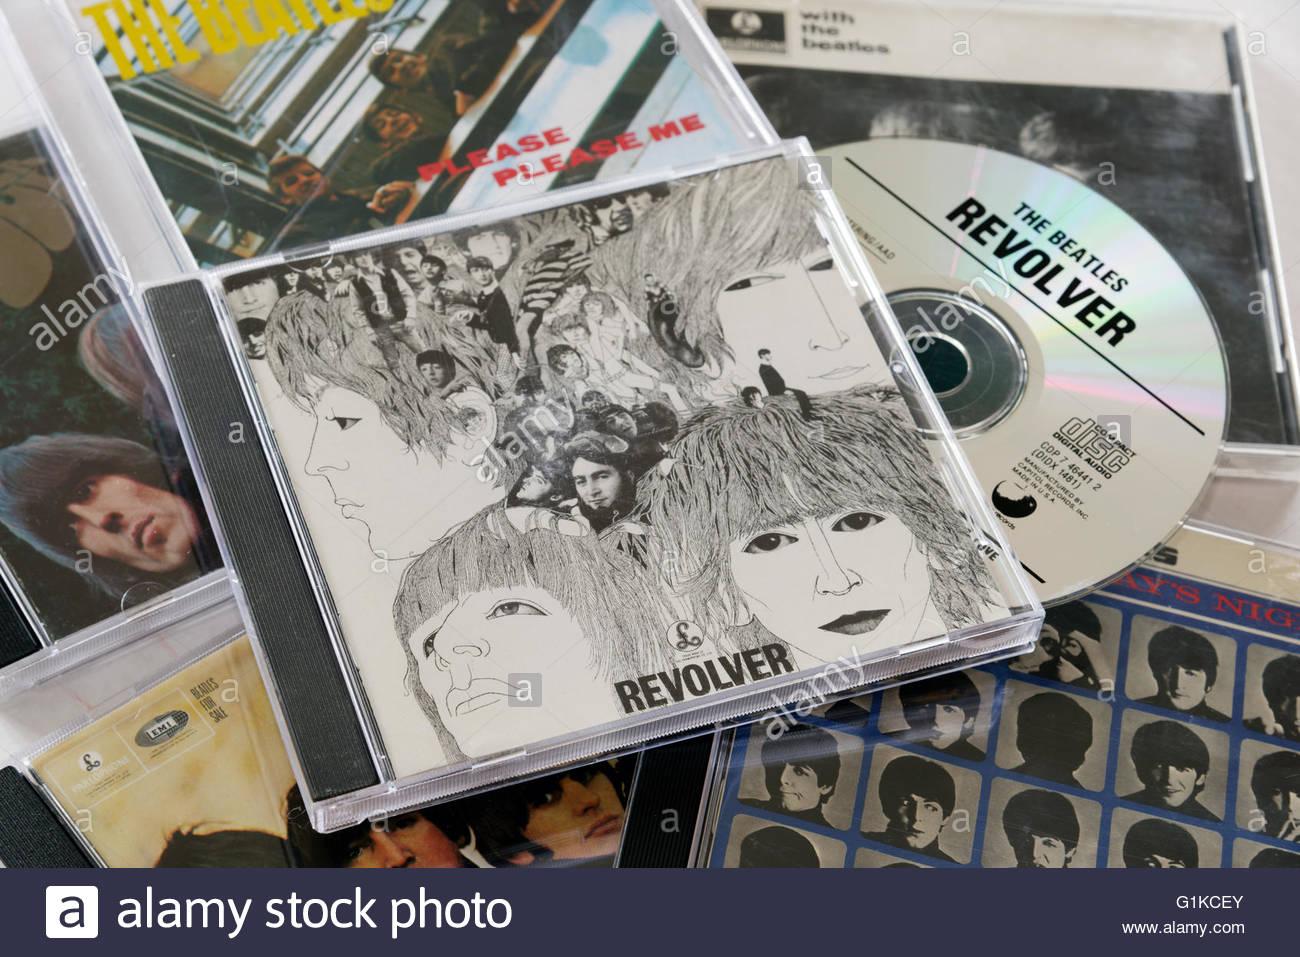 Beatles Revolver CD Stock Photo: 104303779 - Alamy